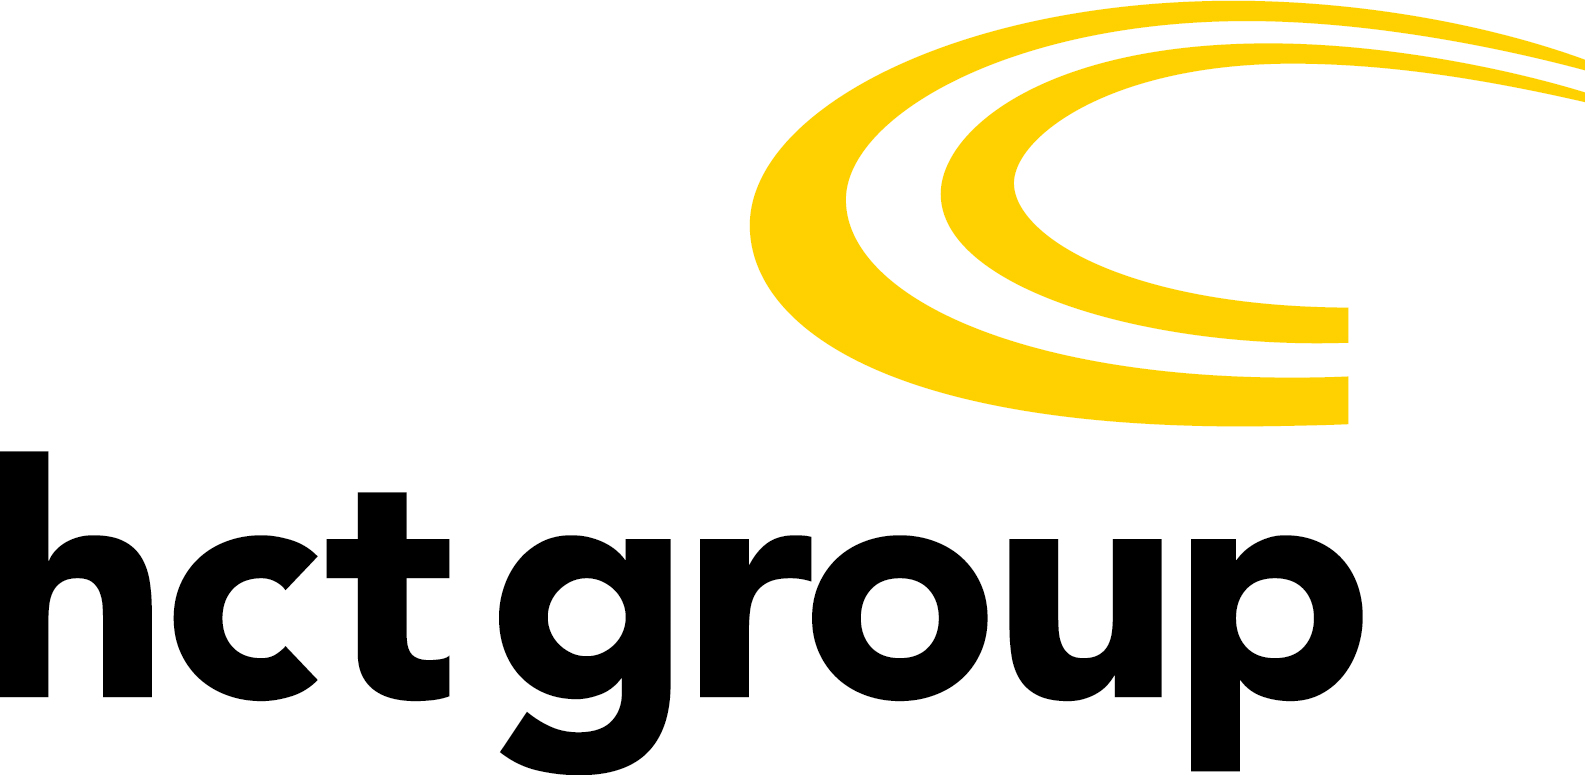 HCT Group logo colour.jpg